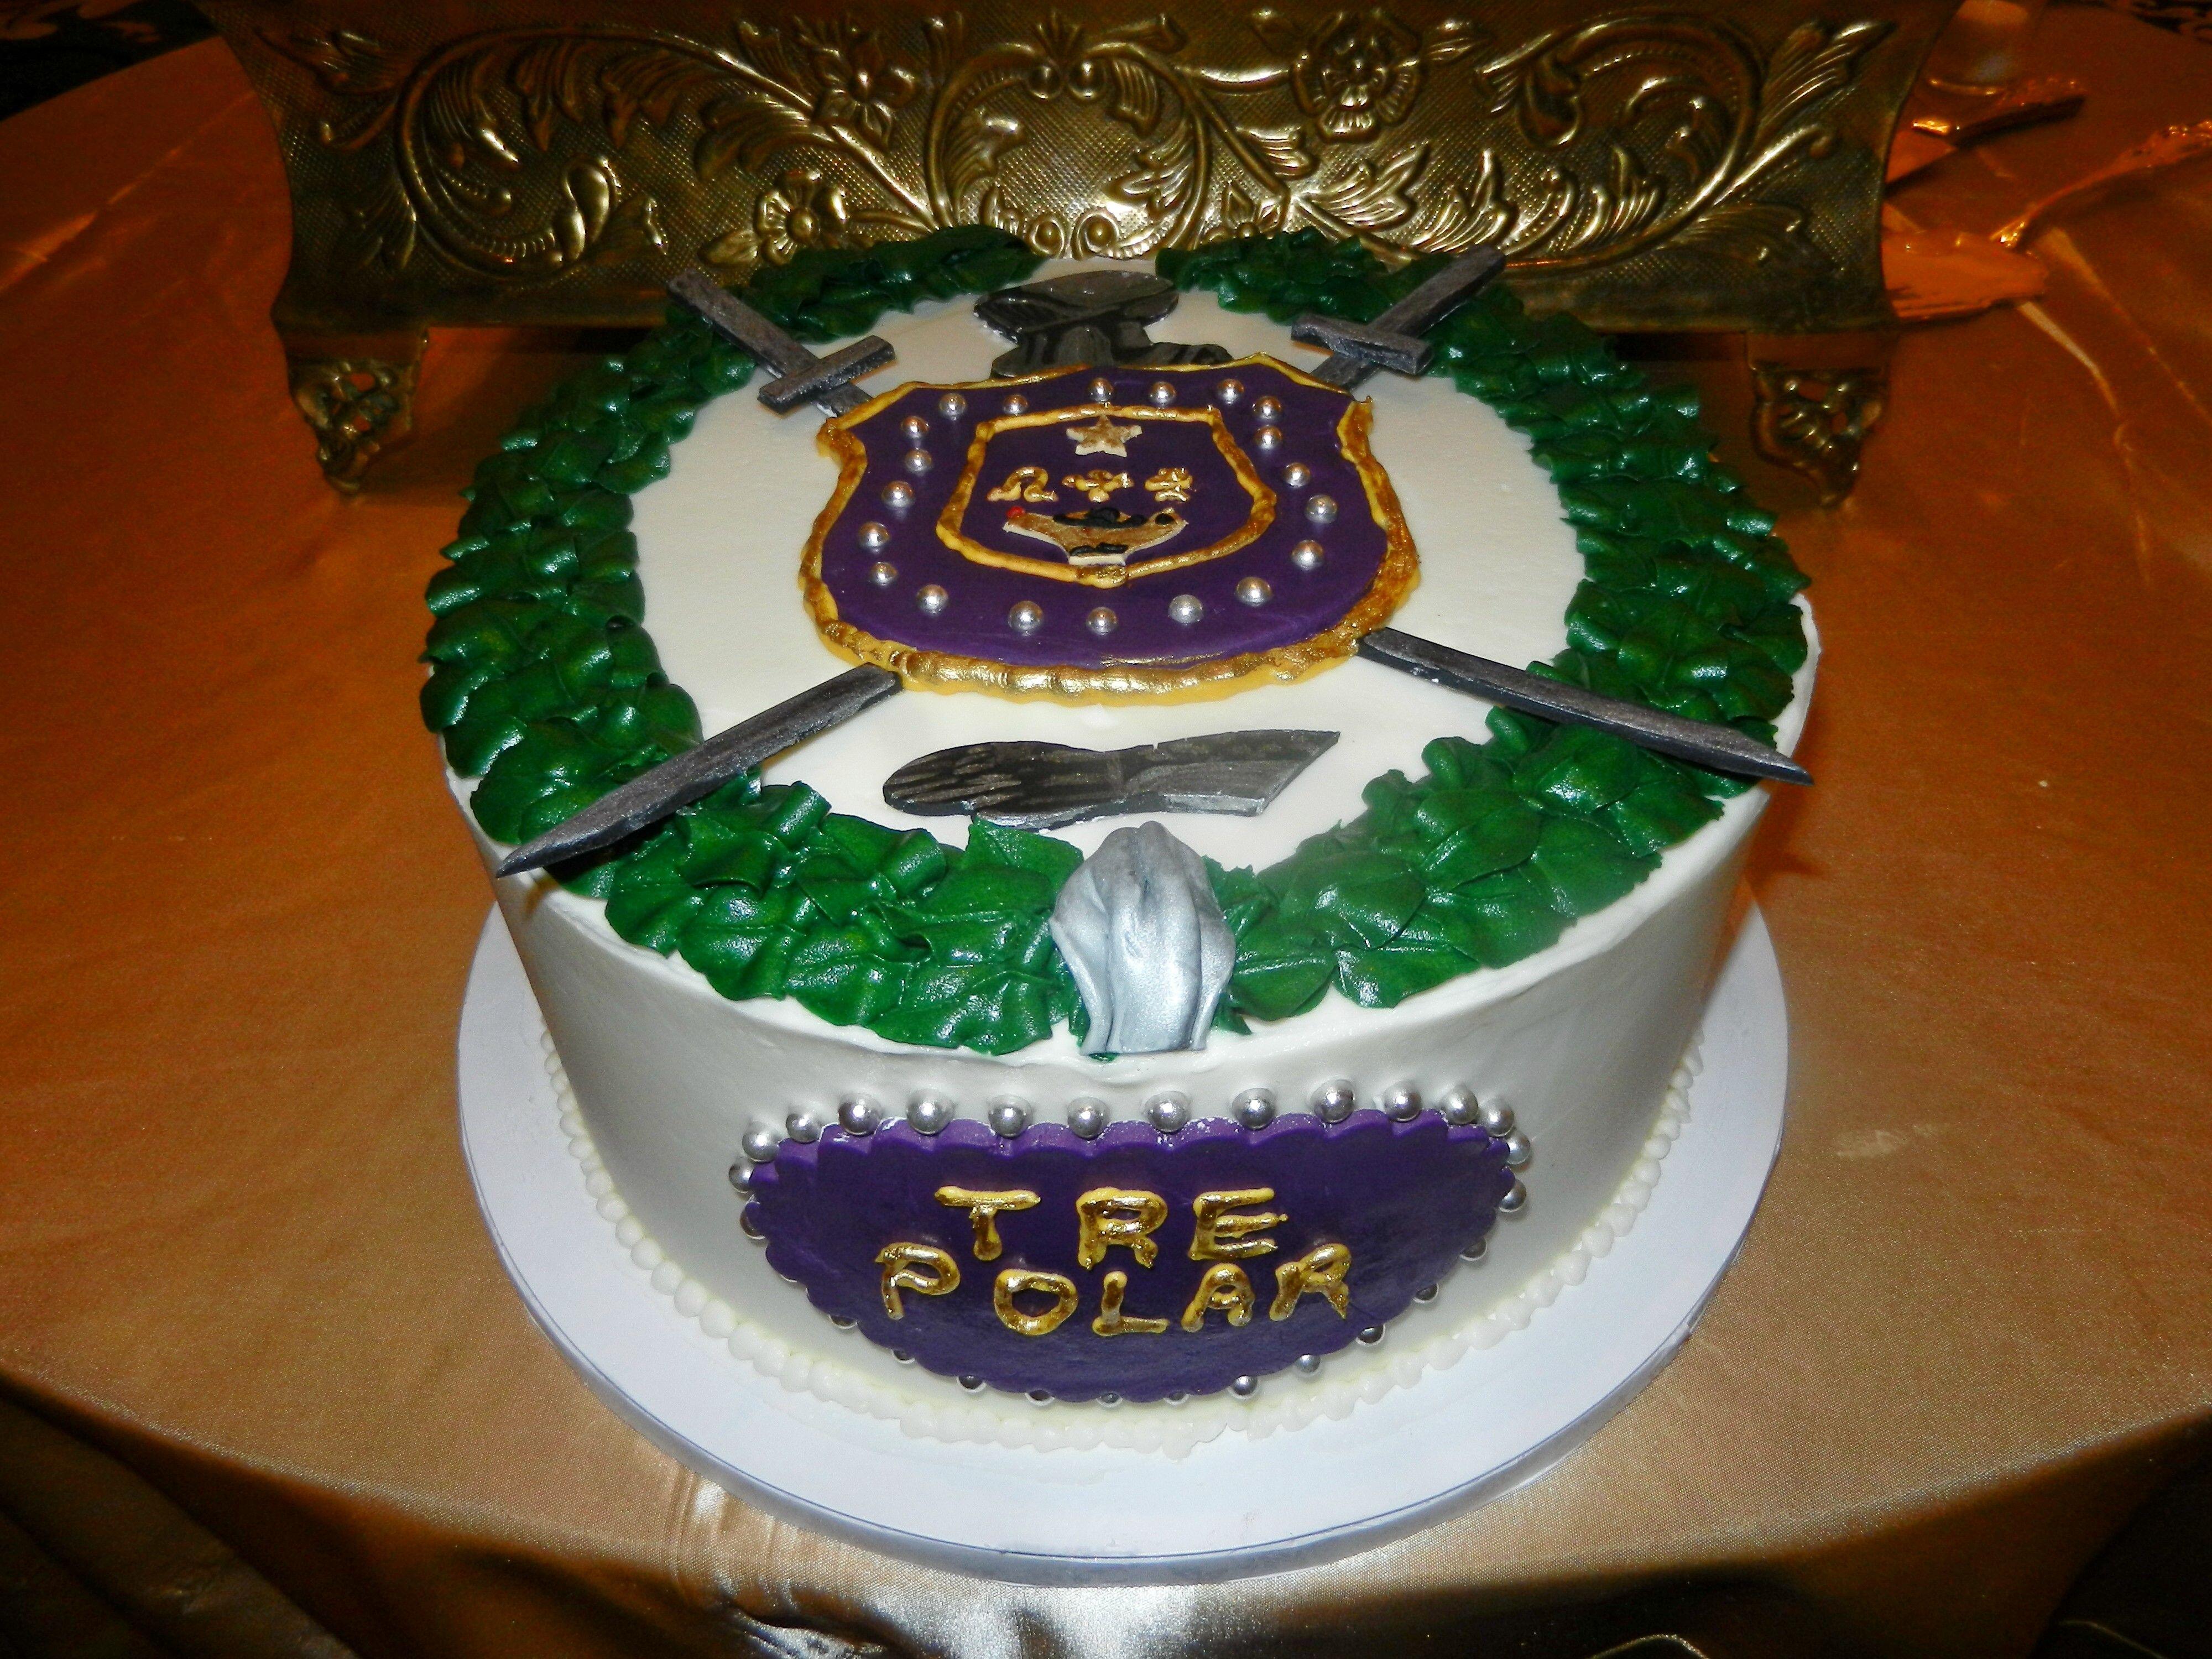 Frat Cake Www.cheesecakeetc.biz Wedding Cakes Charlotte NC